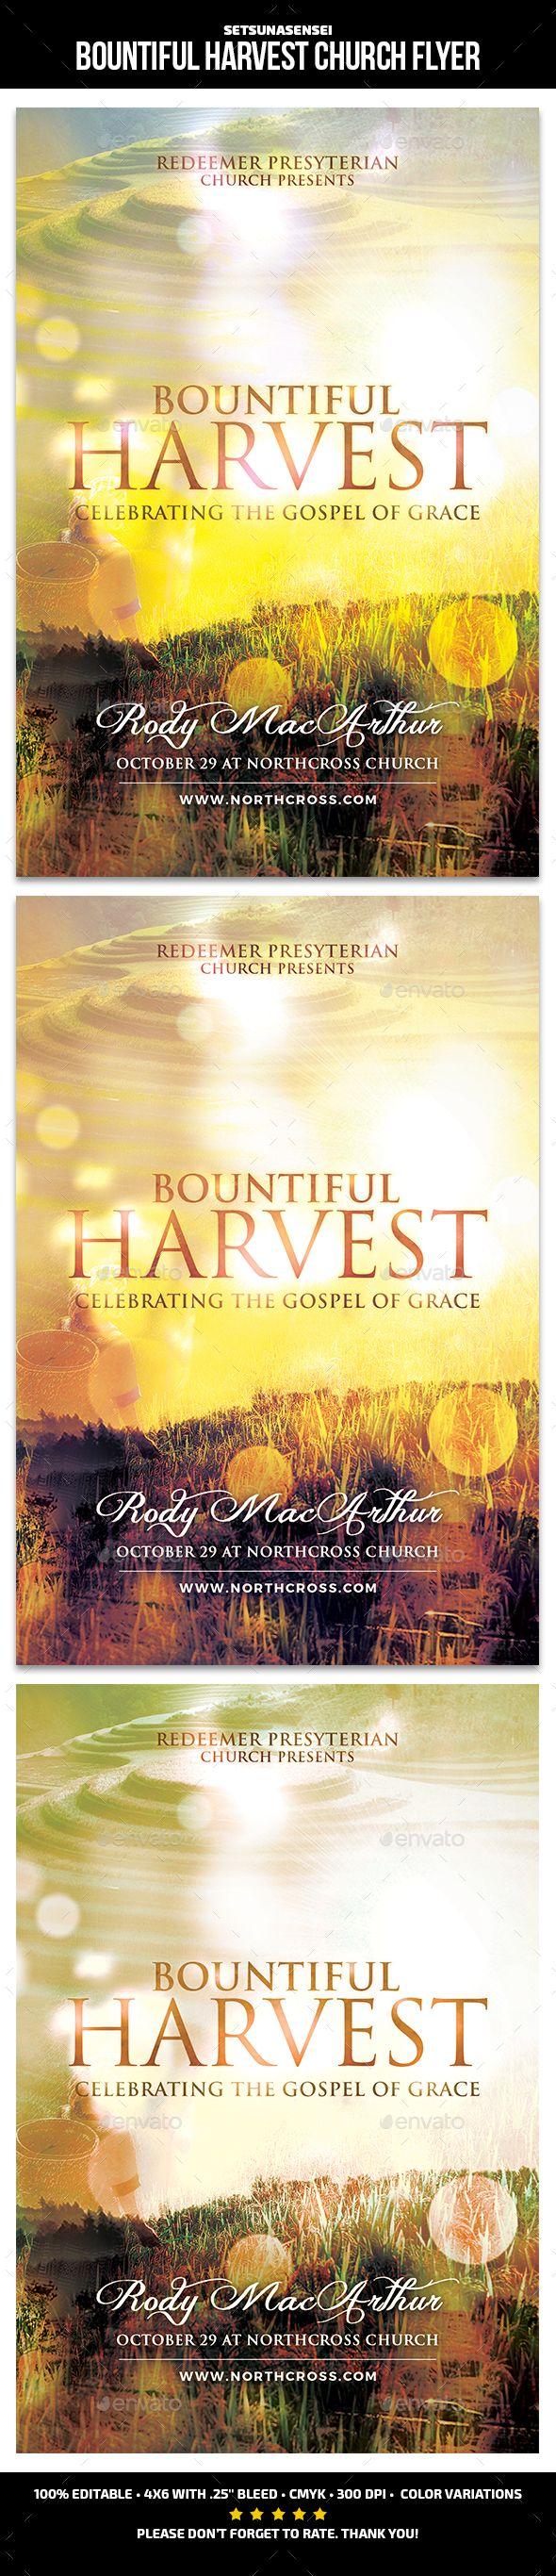 #Bountiful Harvest Church Flye - #Church #Flyers